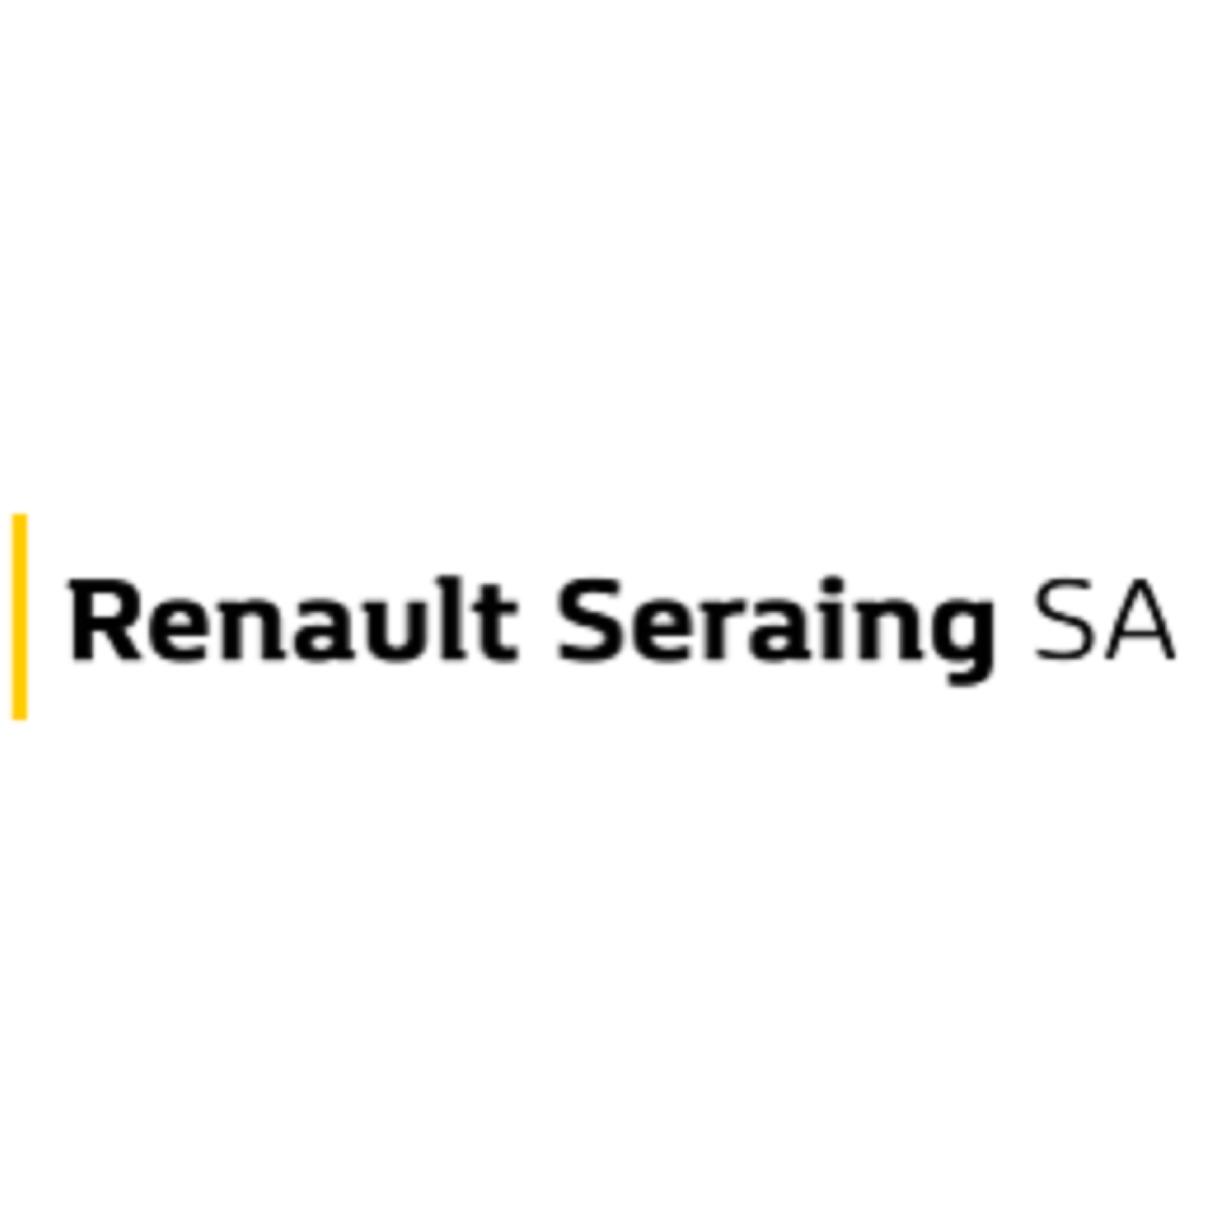 Renault Seraing